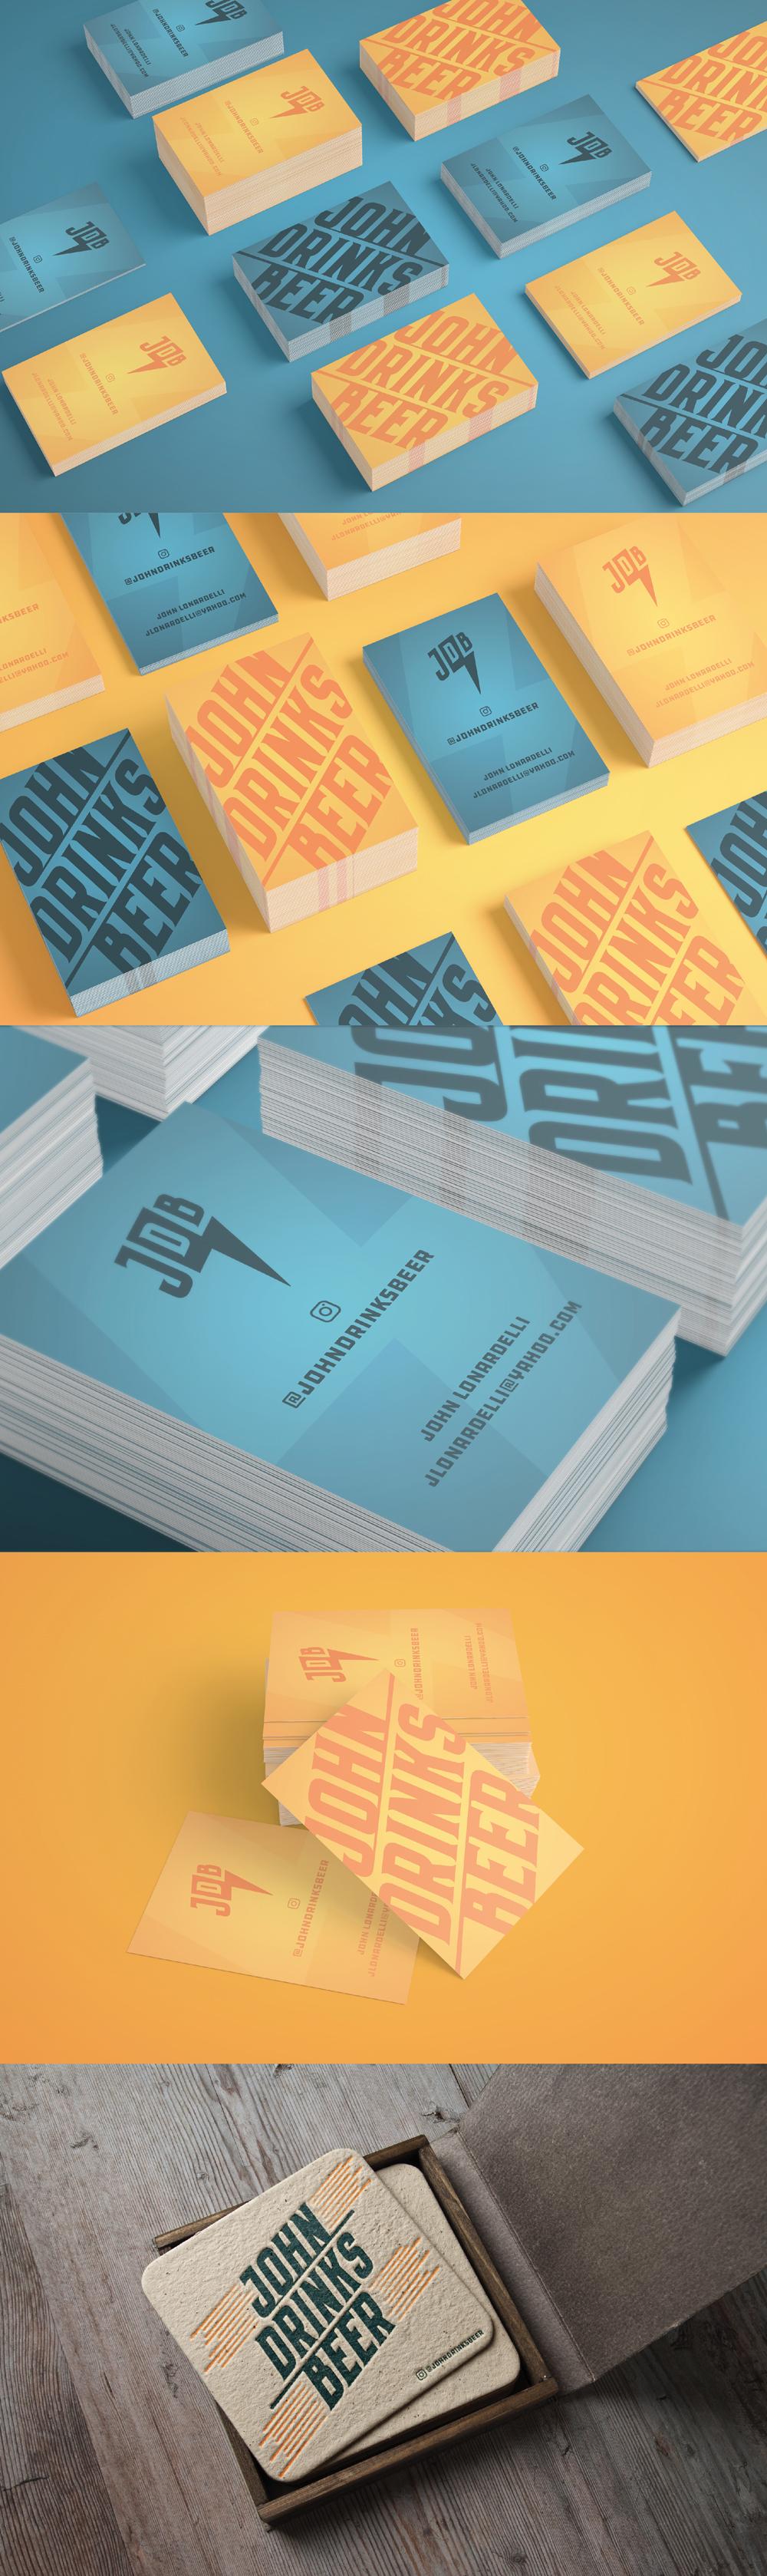 JDB Branded Cards & Coasters